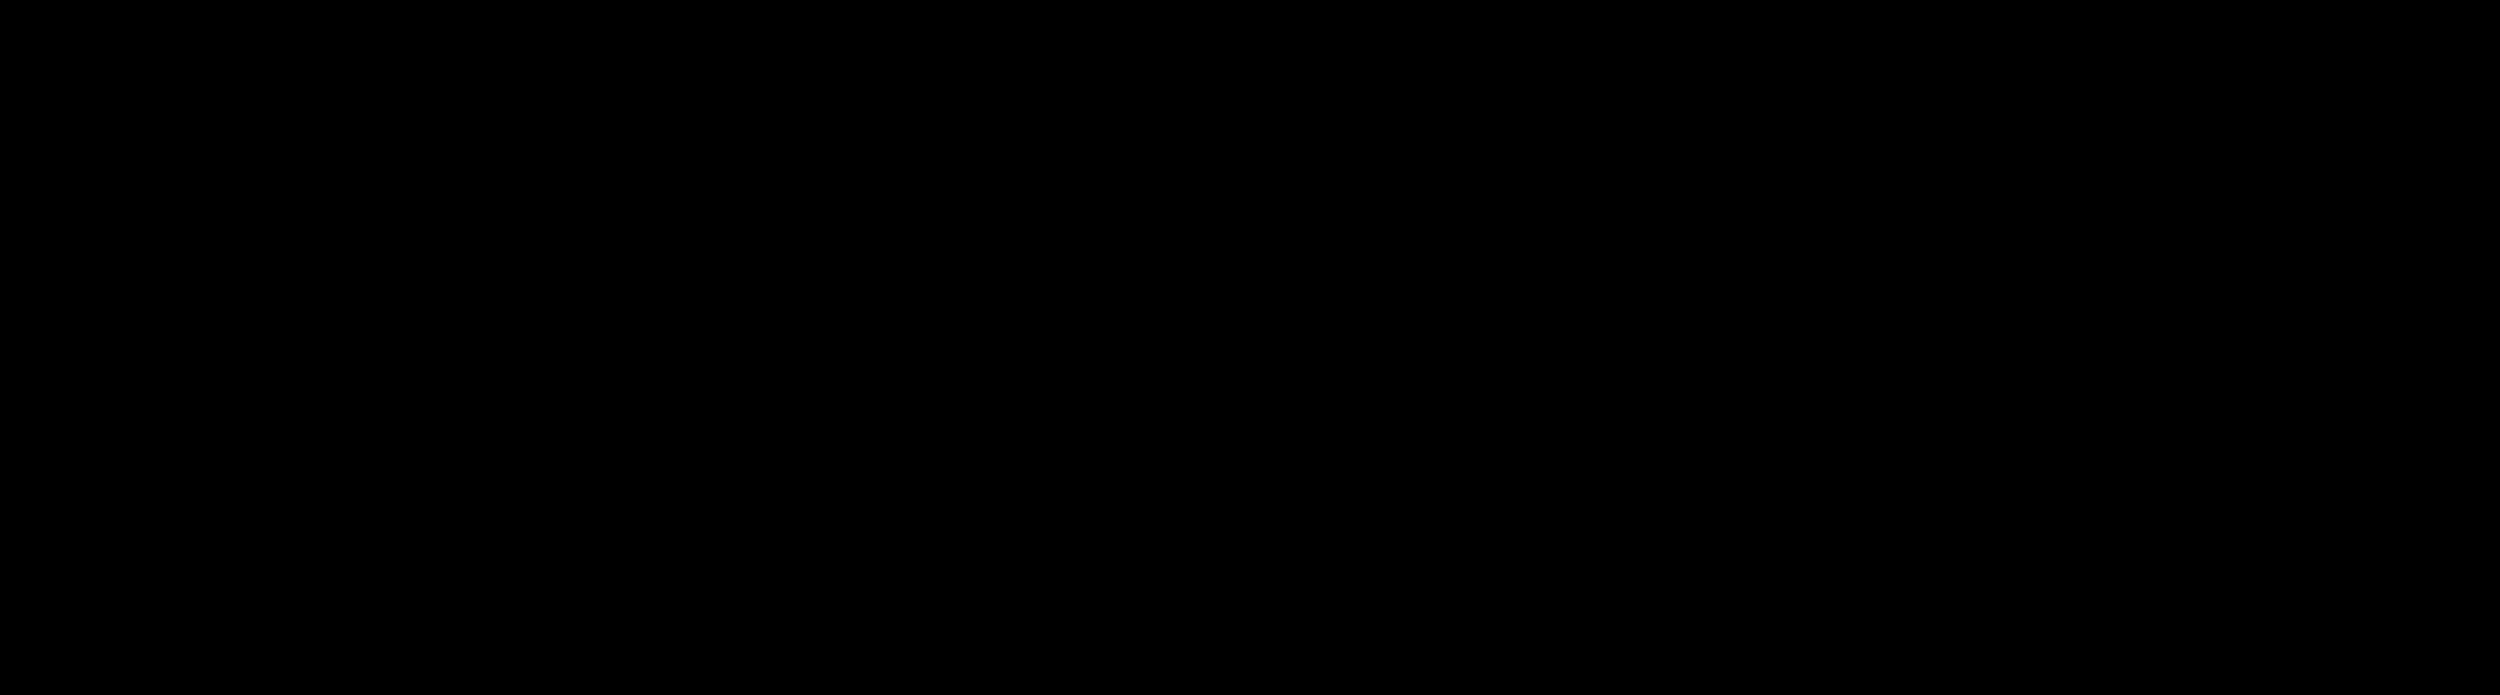 CF Banner 1920x540_3.png